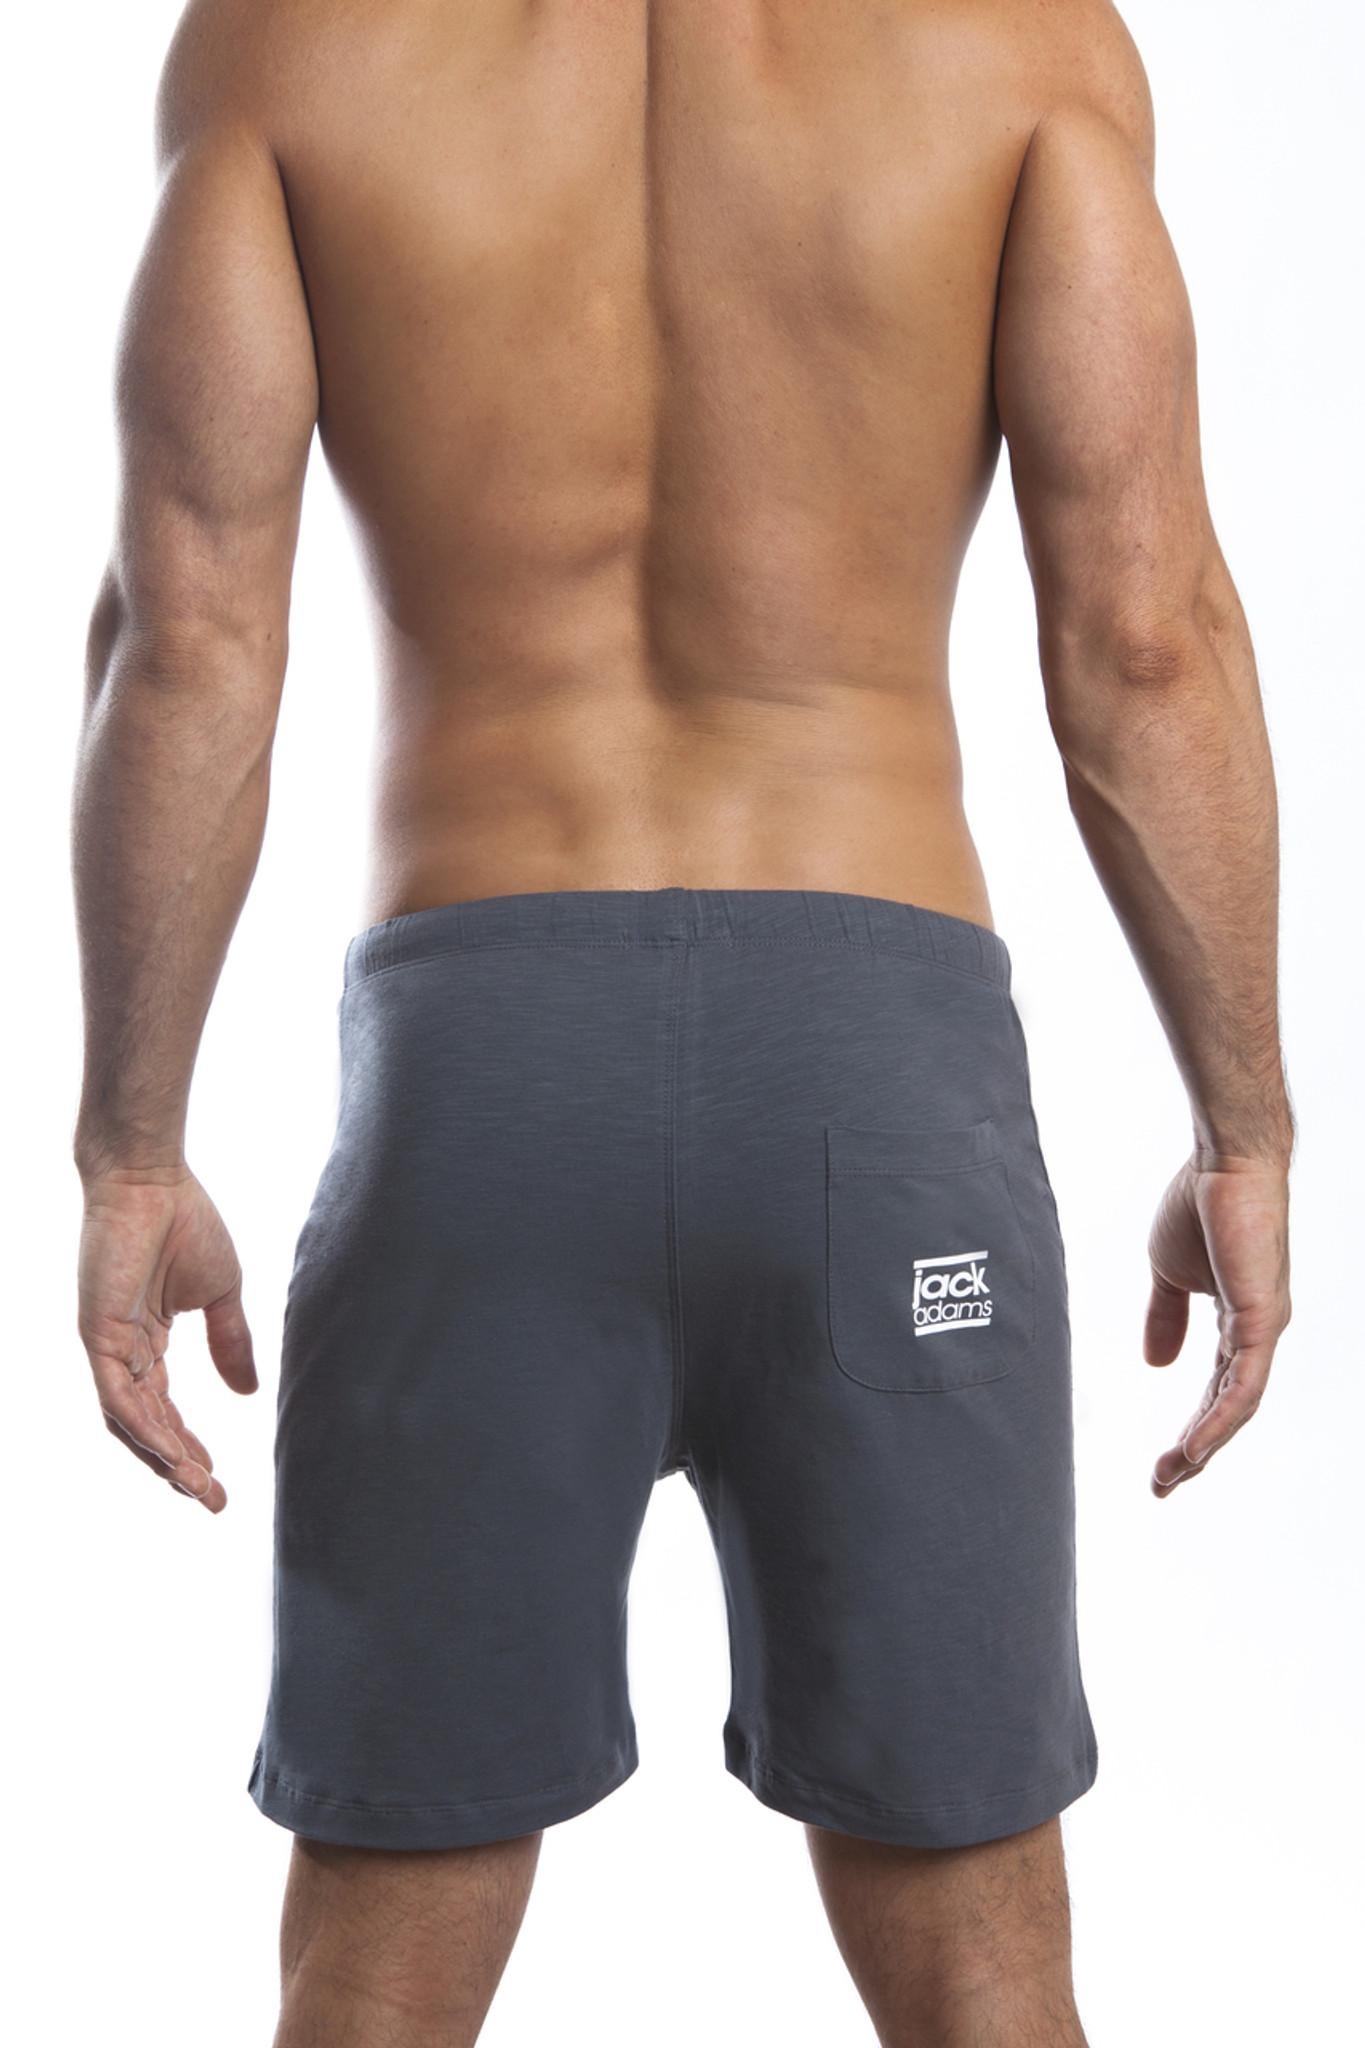 Jack Adams Yoga Short